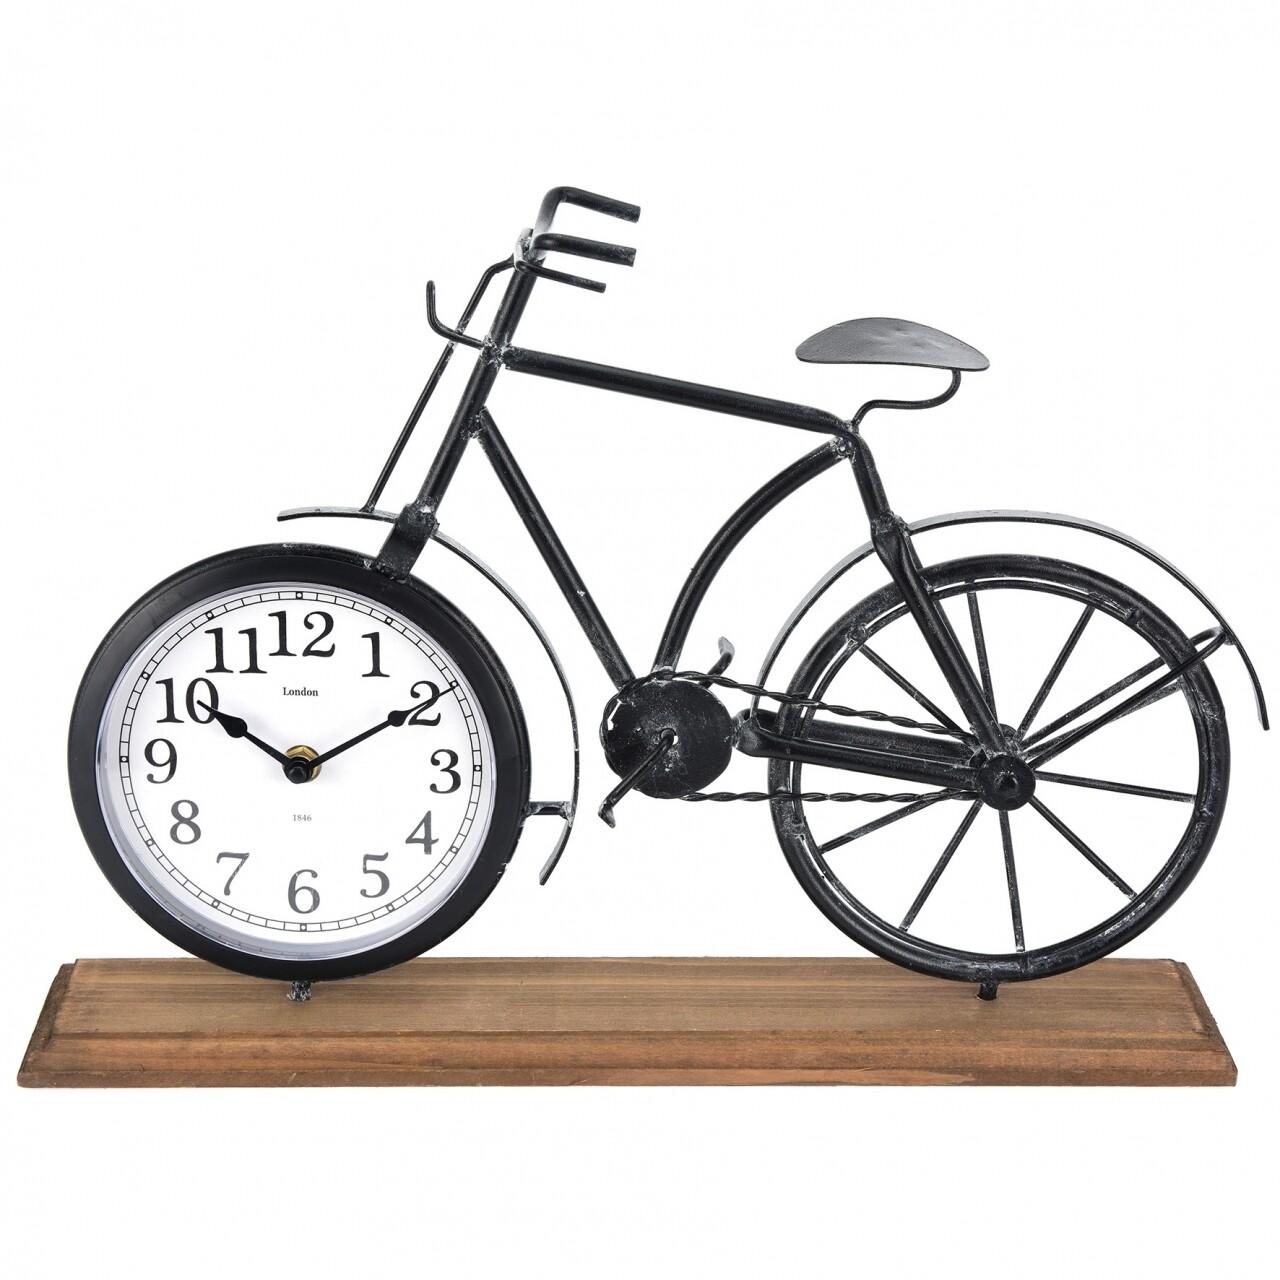 Ceas de masa Bike, 41.5 x 10 x 29 cm, metal si lemn, alb/negru/natur